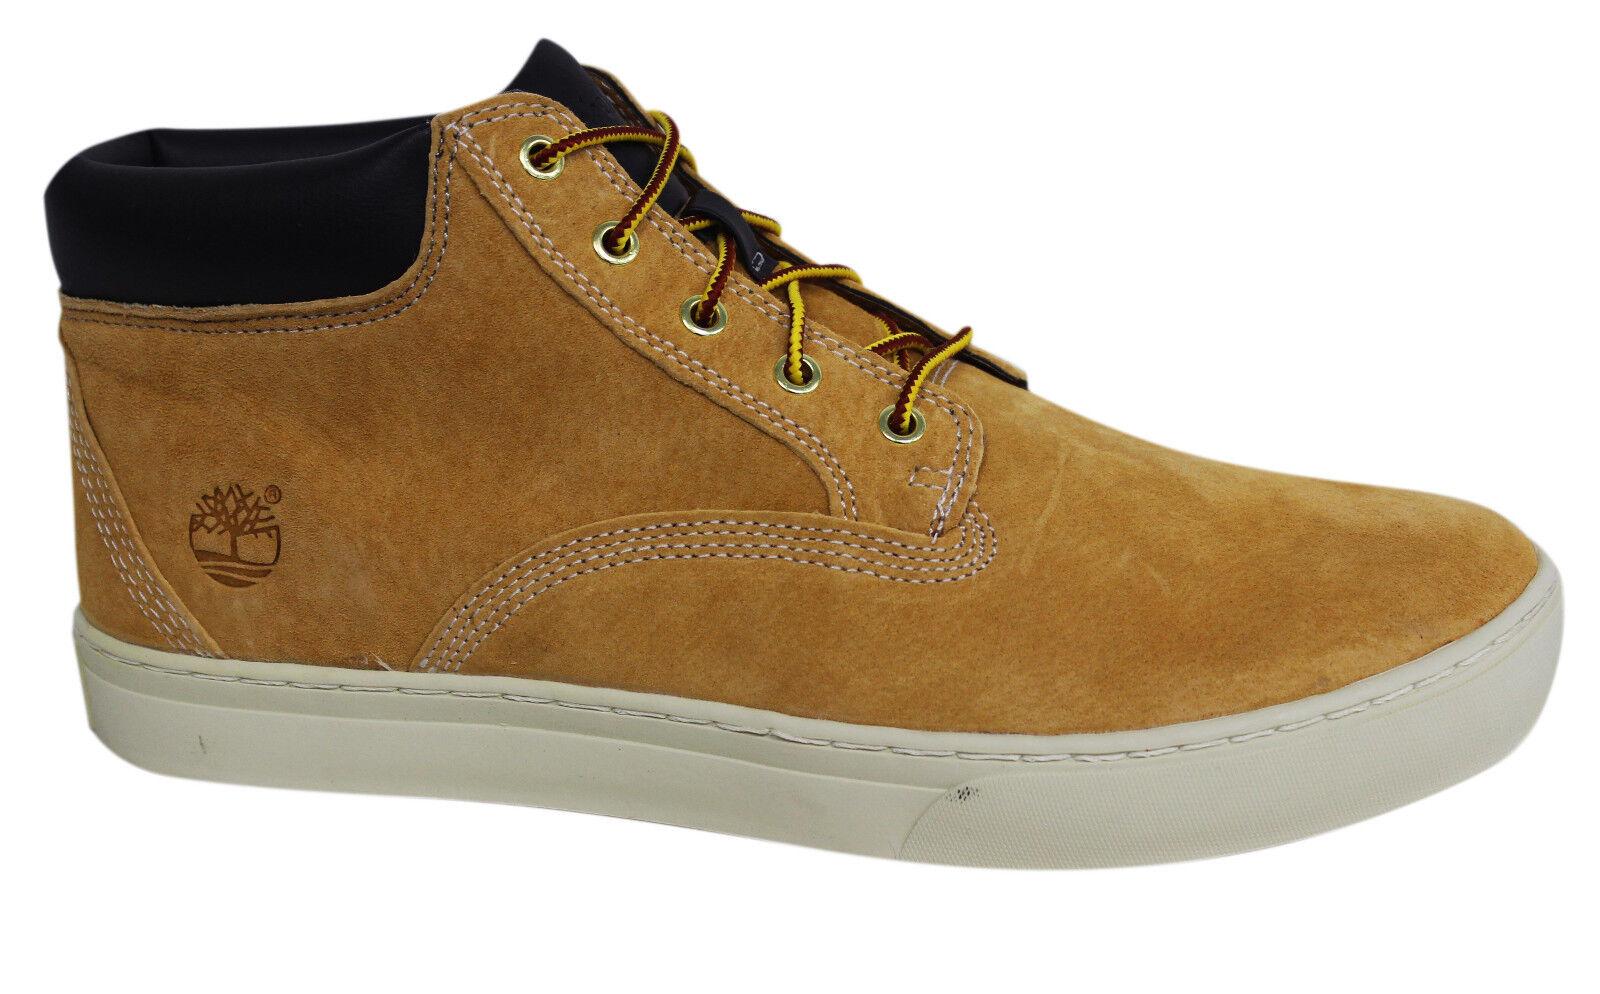 Details zu Timberland Dauset Chukka Leder Herren Stiefel Schnür Schuhe Weizen A1613 B86E